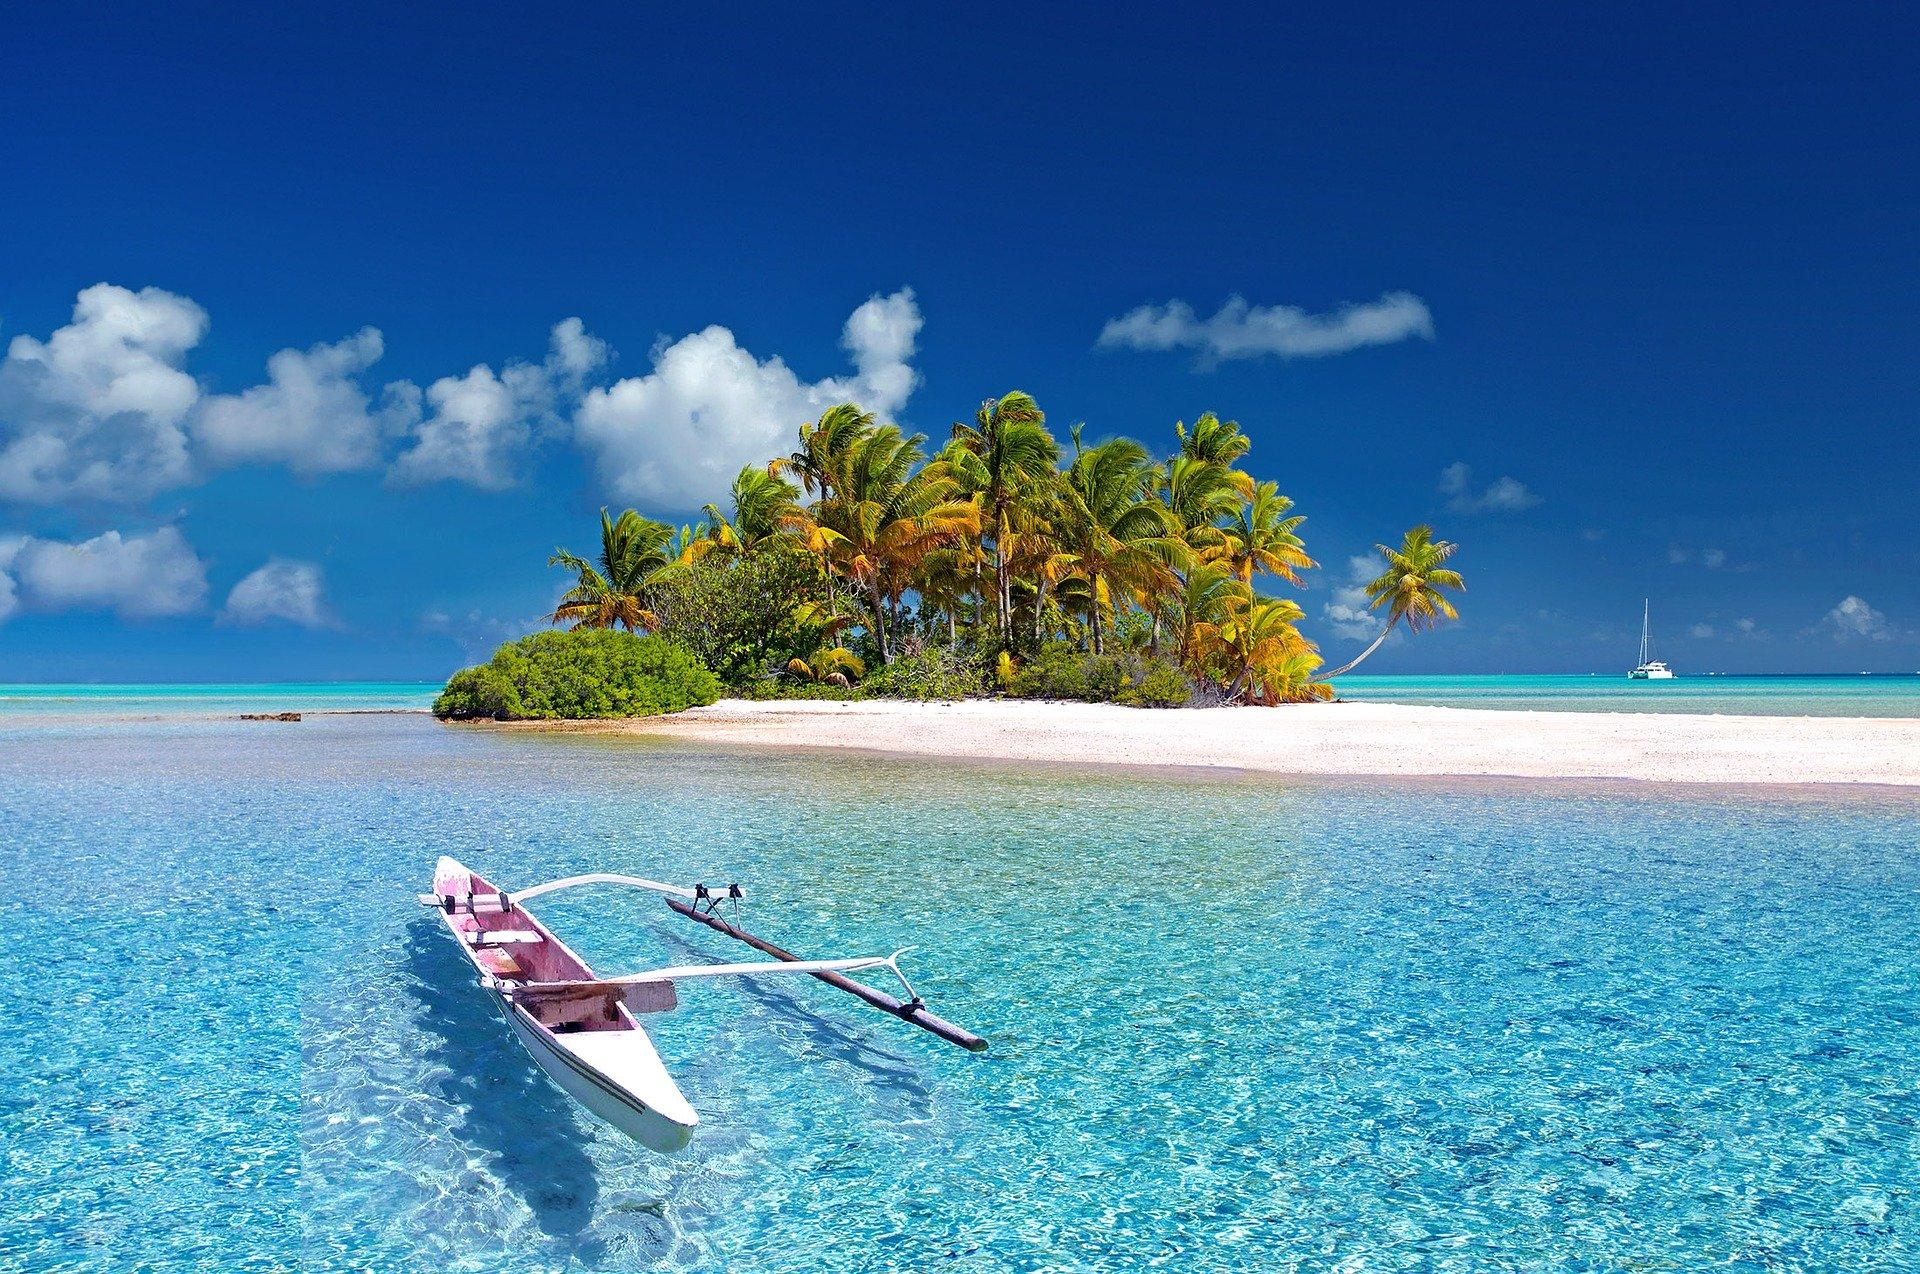 https://tahititourisme.fr/wp-content/uploads/2020/10/polynesia-3021072_1920.jpg